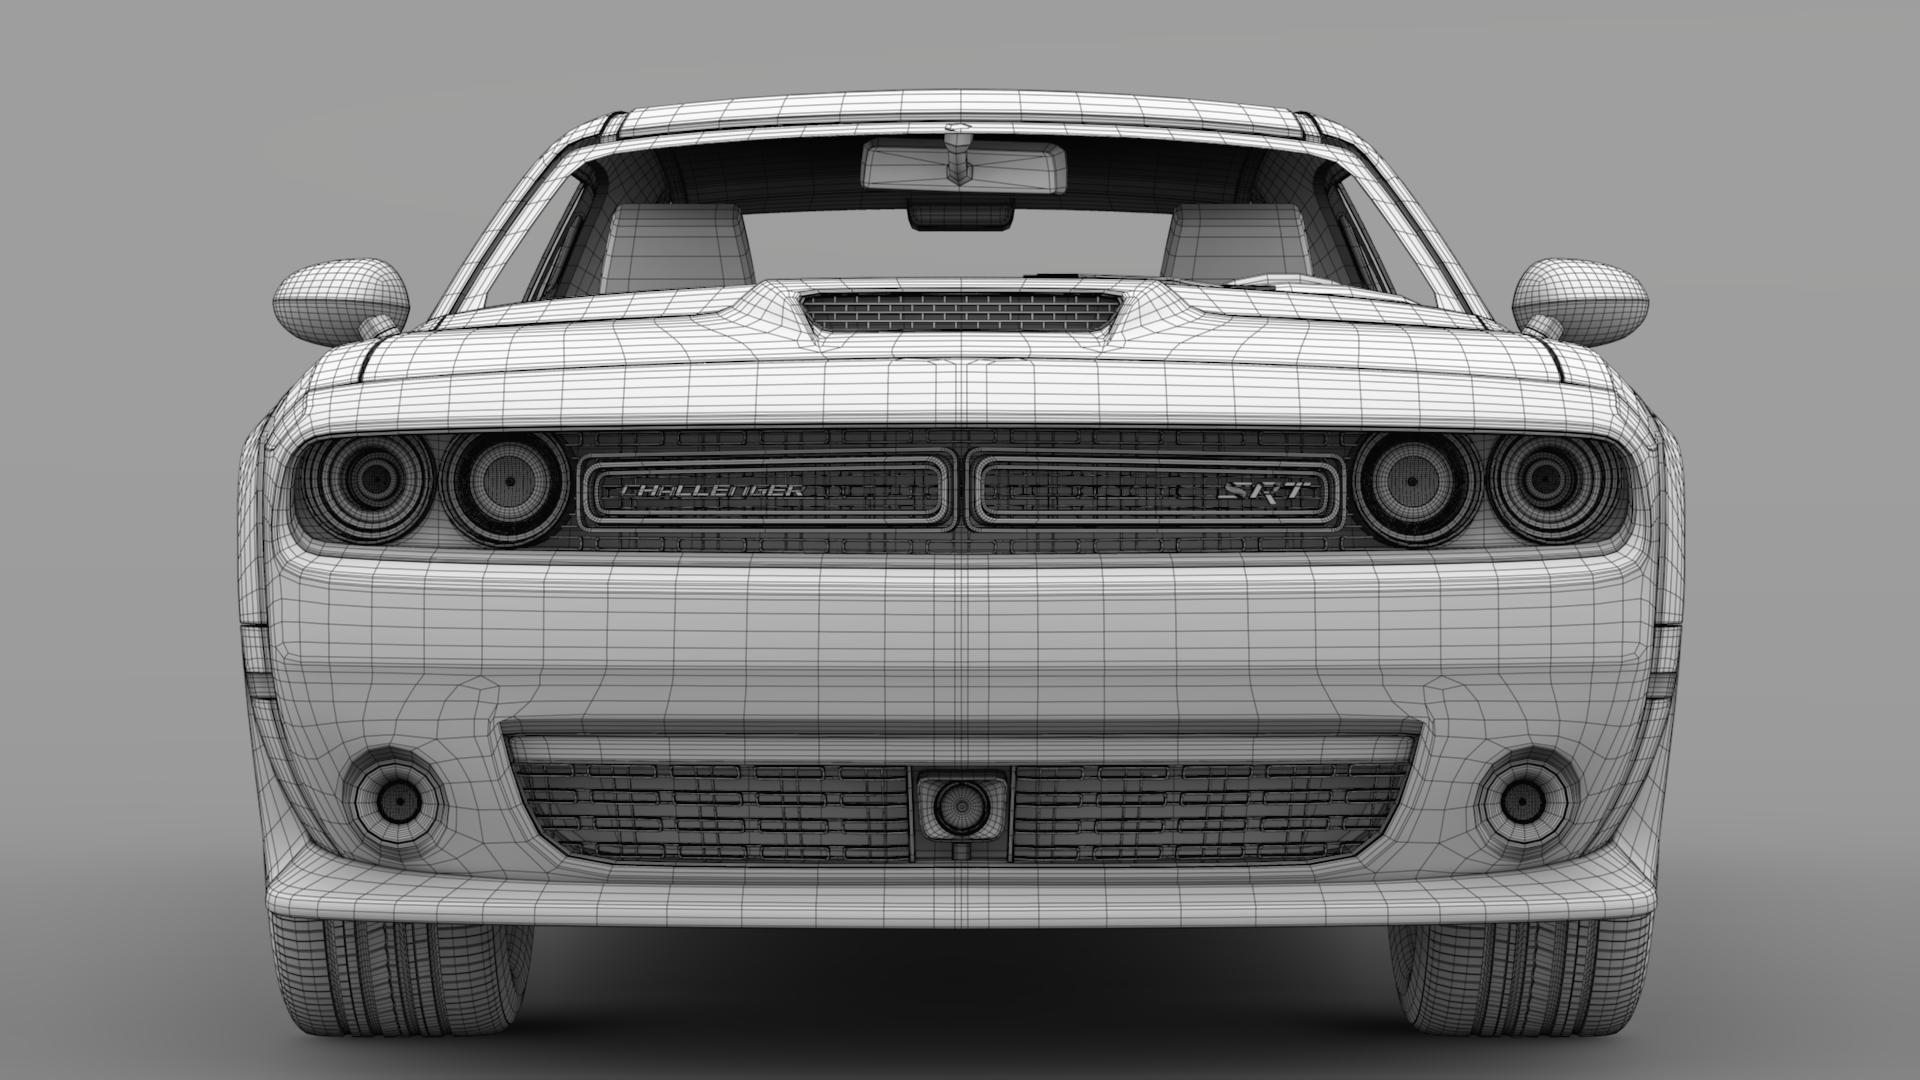 Dodge Challenger srt widbody 2017 3d model 3ds max fbx c4d ar gyfer yr hrc xsi obj